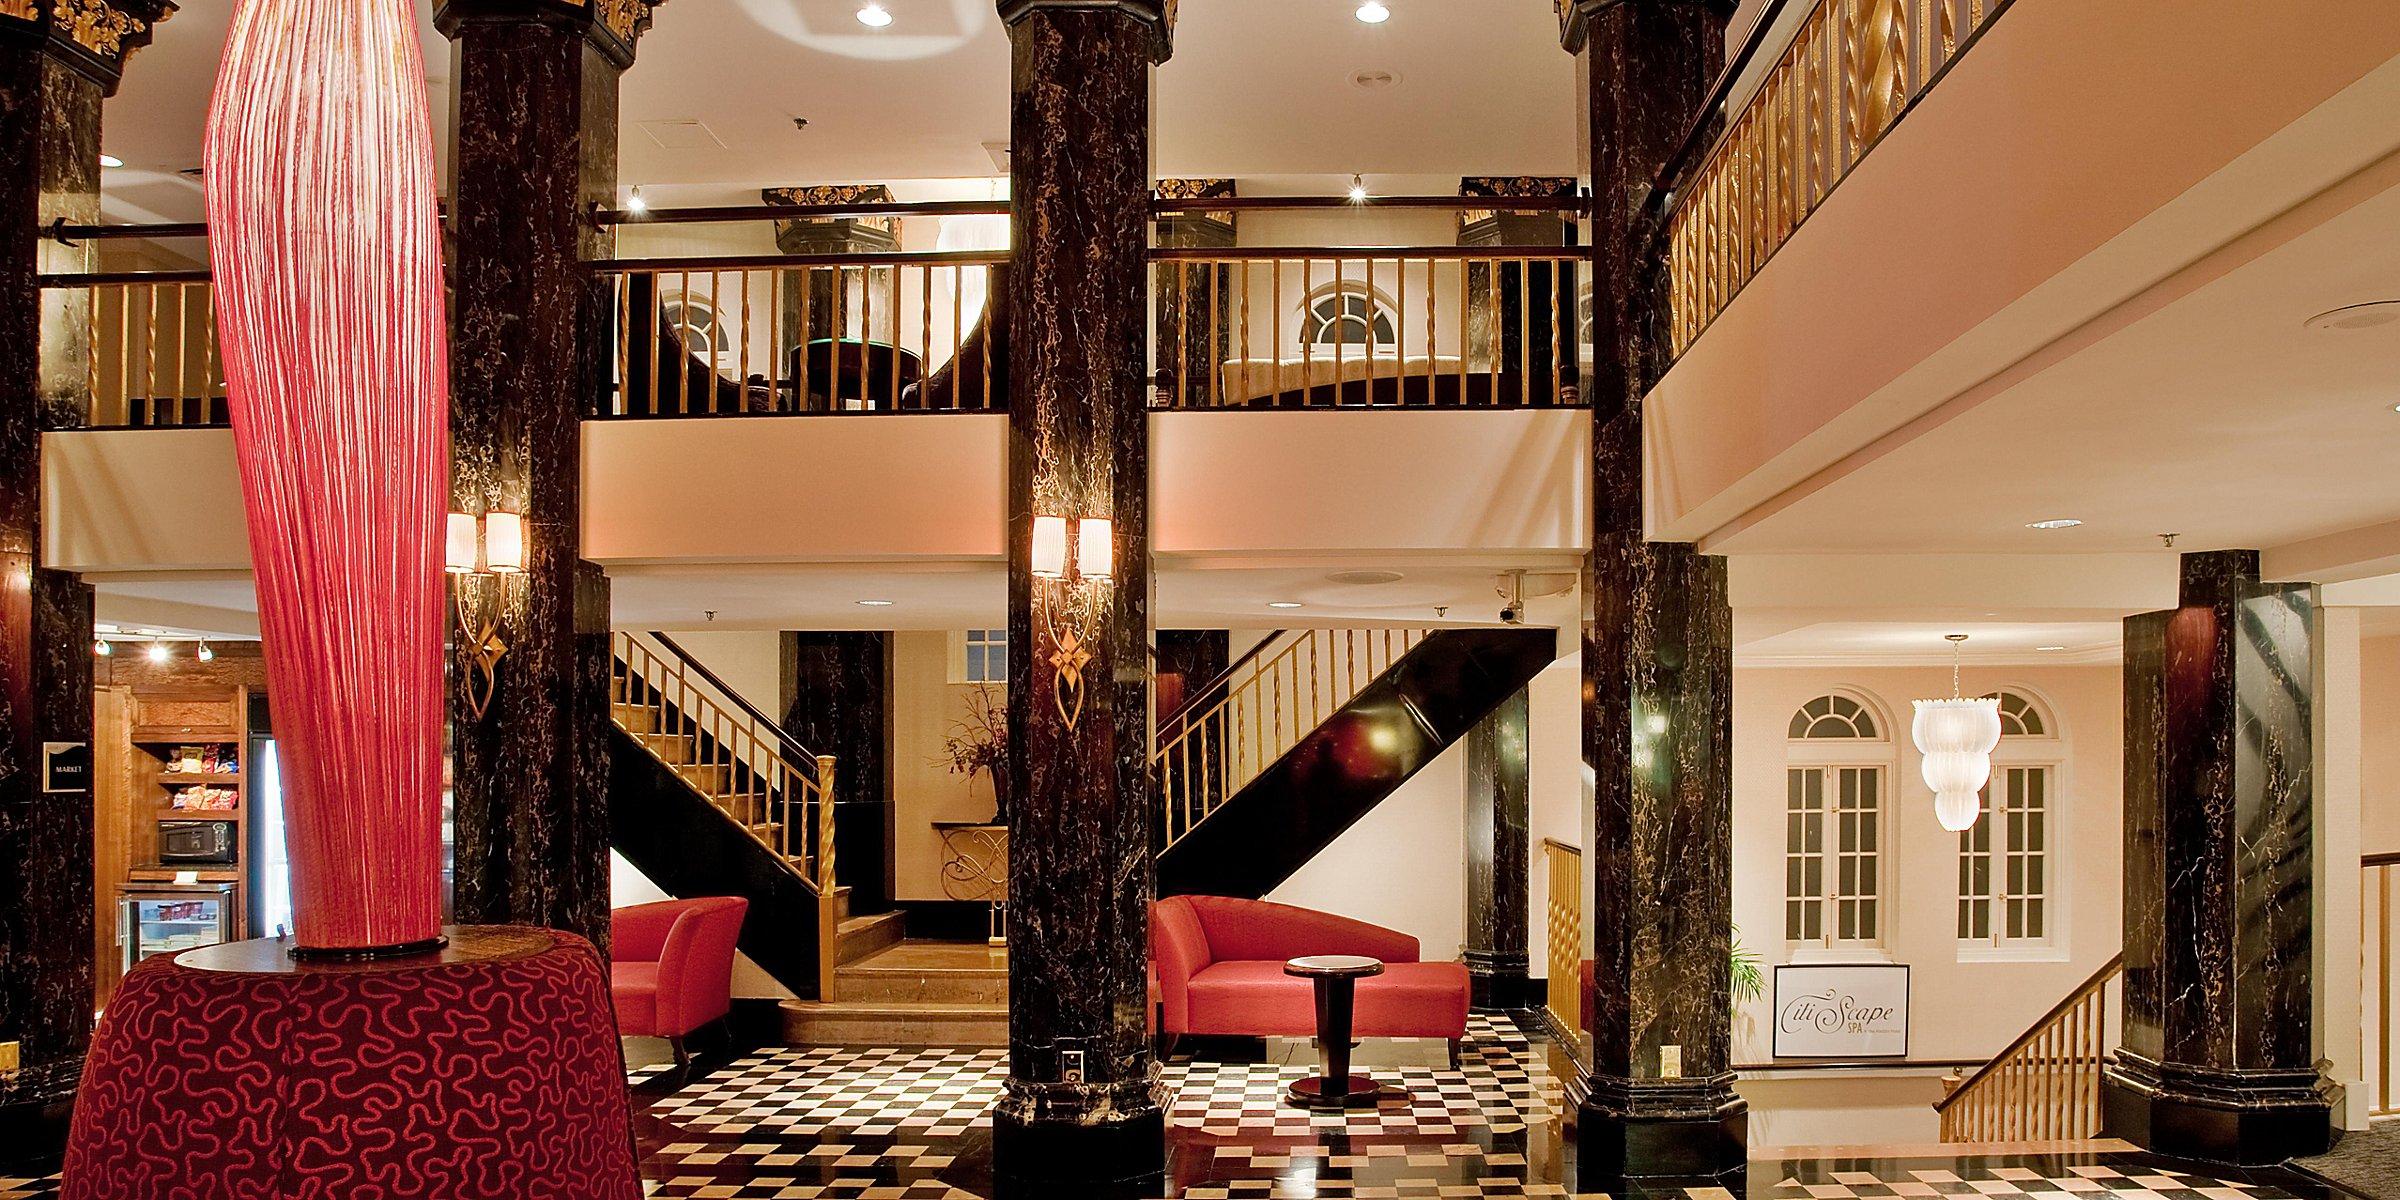 Downtown Kansas City Hotel - Holiday Inn KC Aladdin Hotel